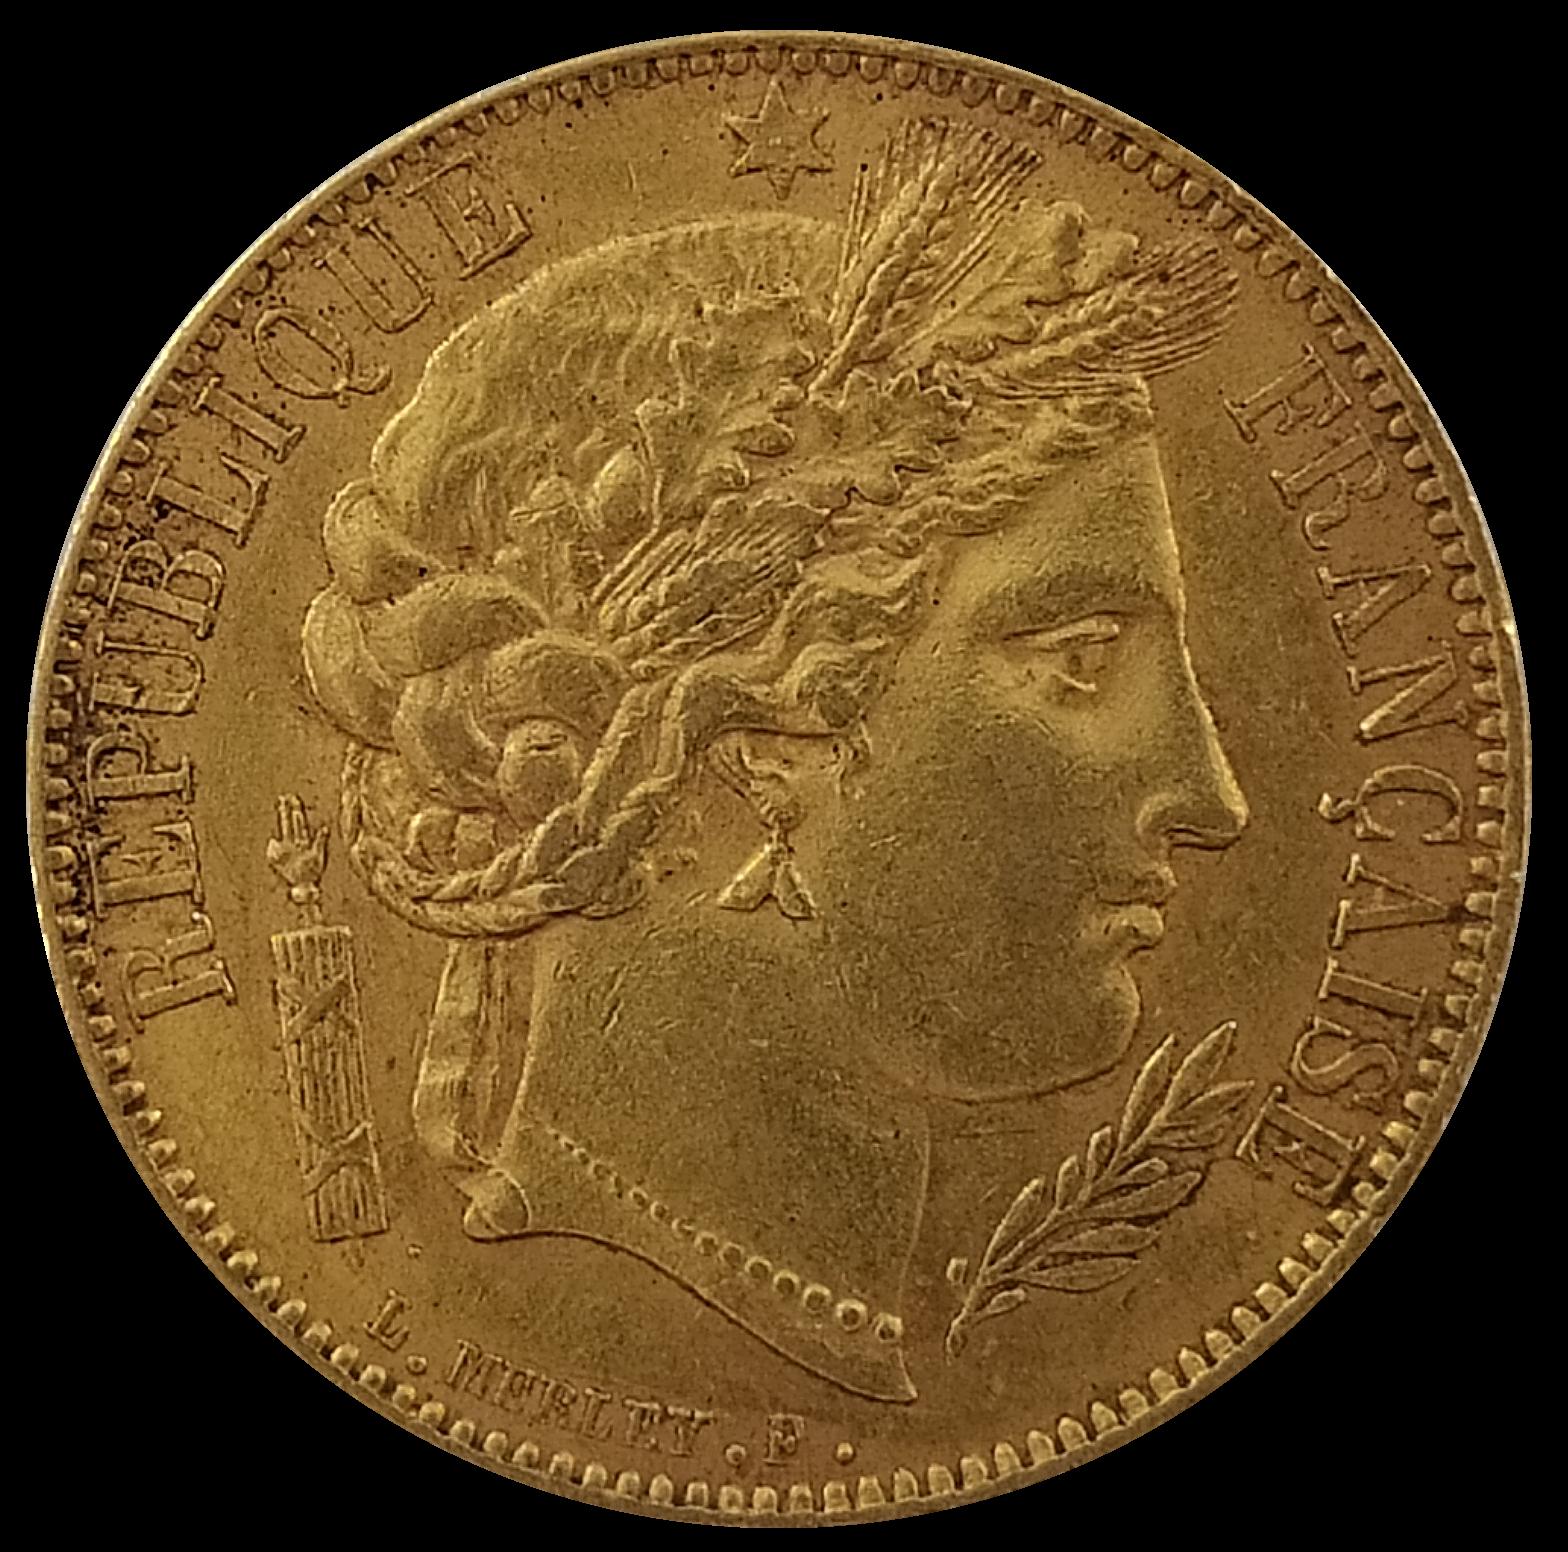 Cérès Napoléons or